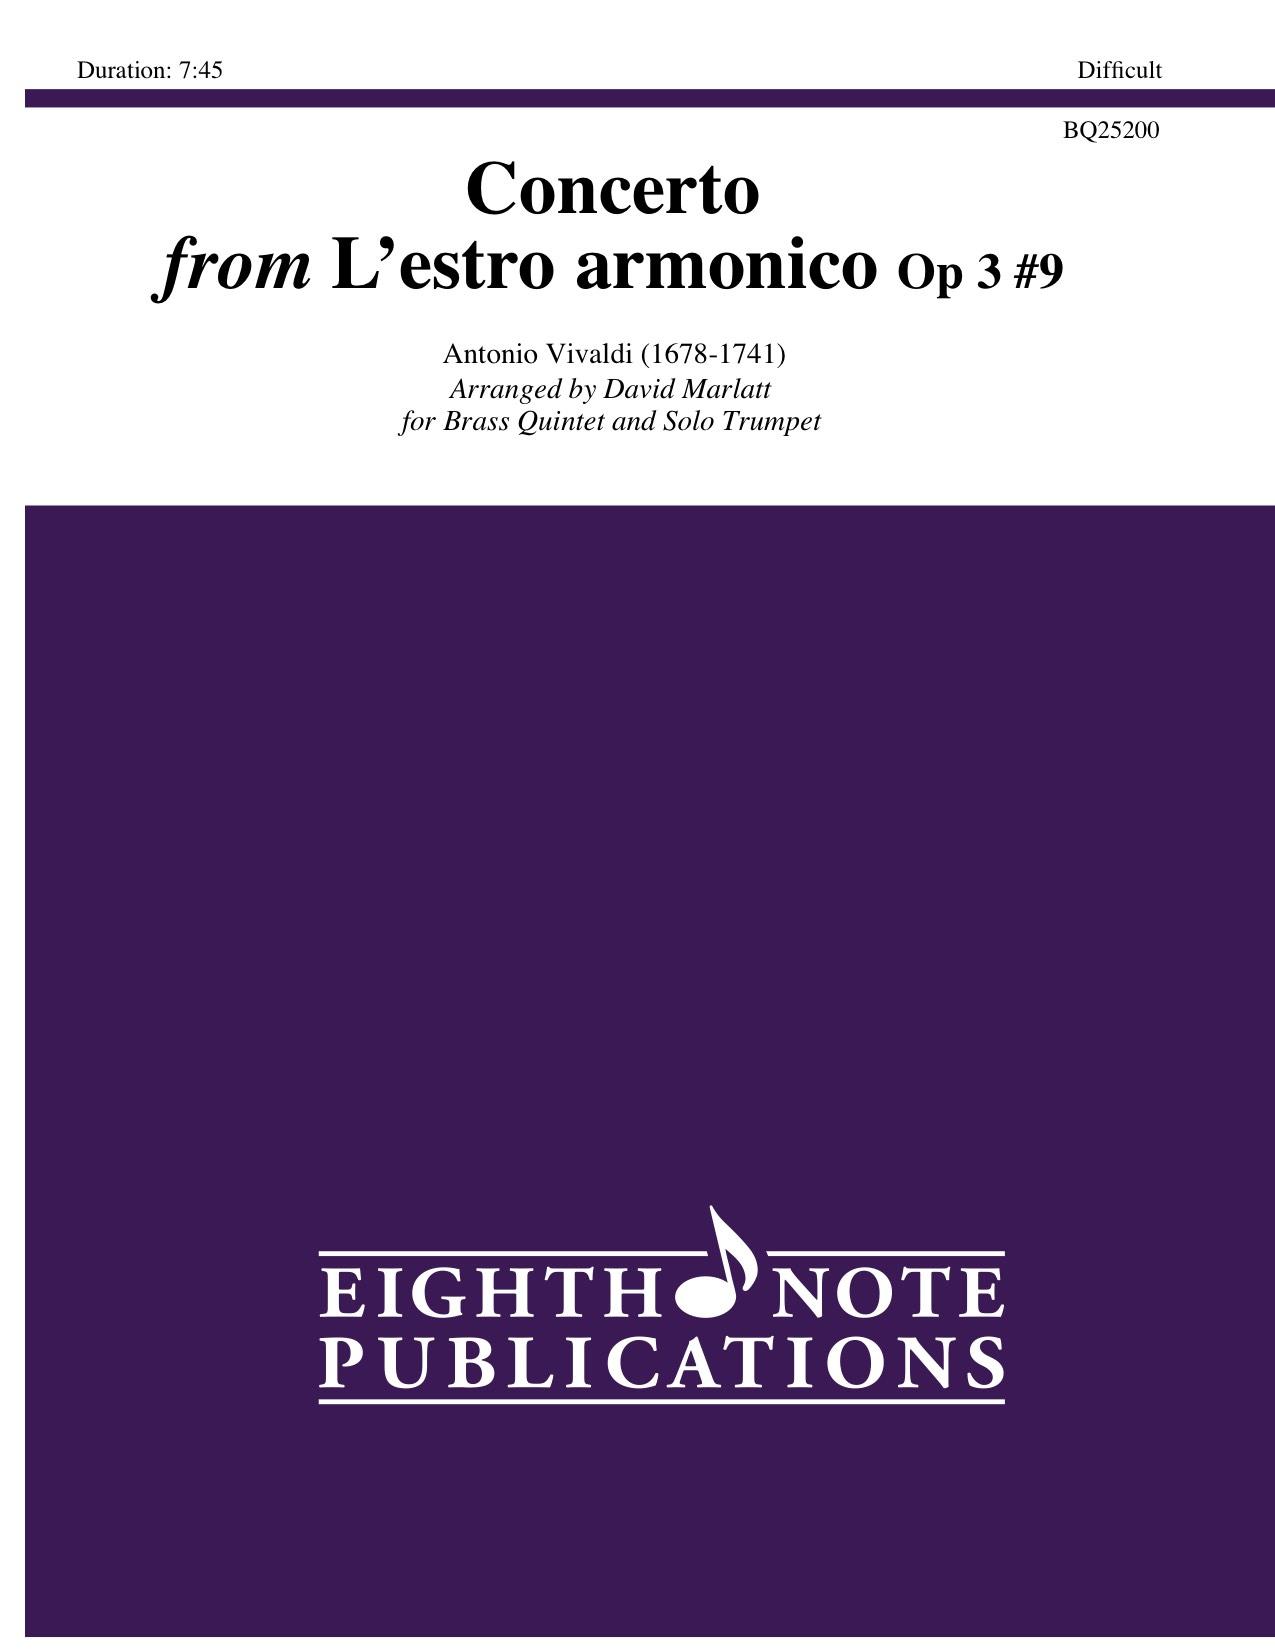 Concerto from Lestro armonico Op 3 #9 -